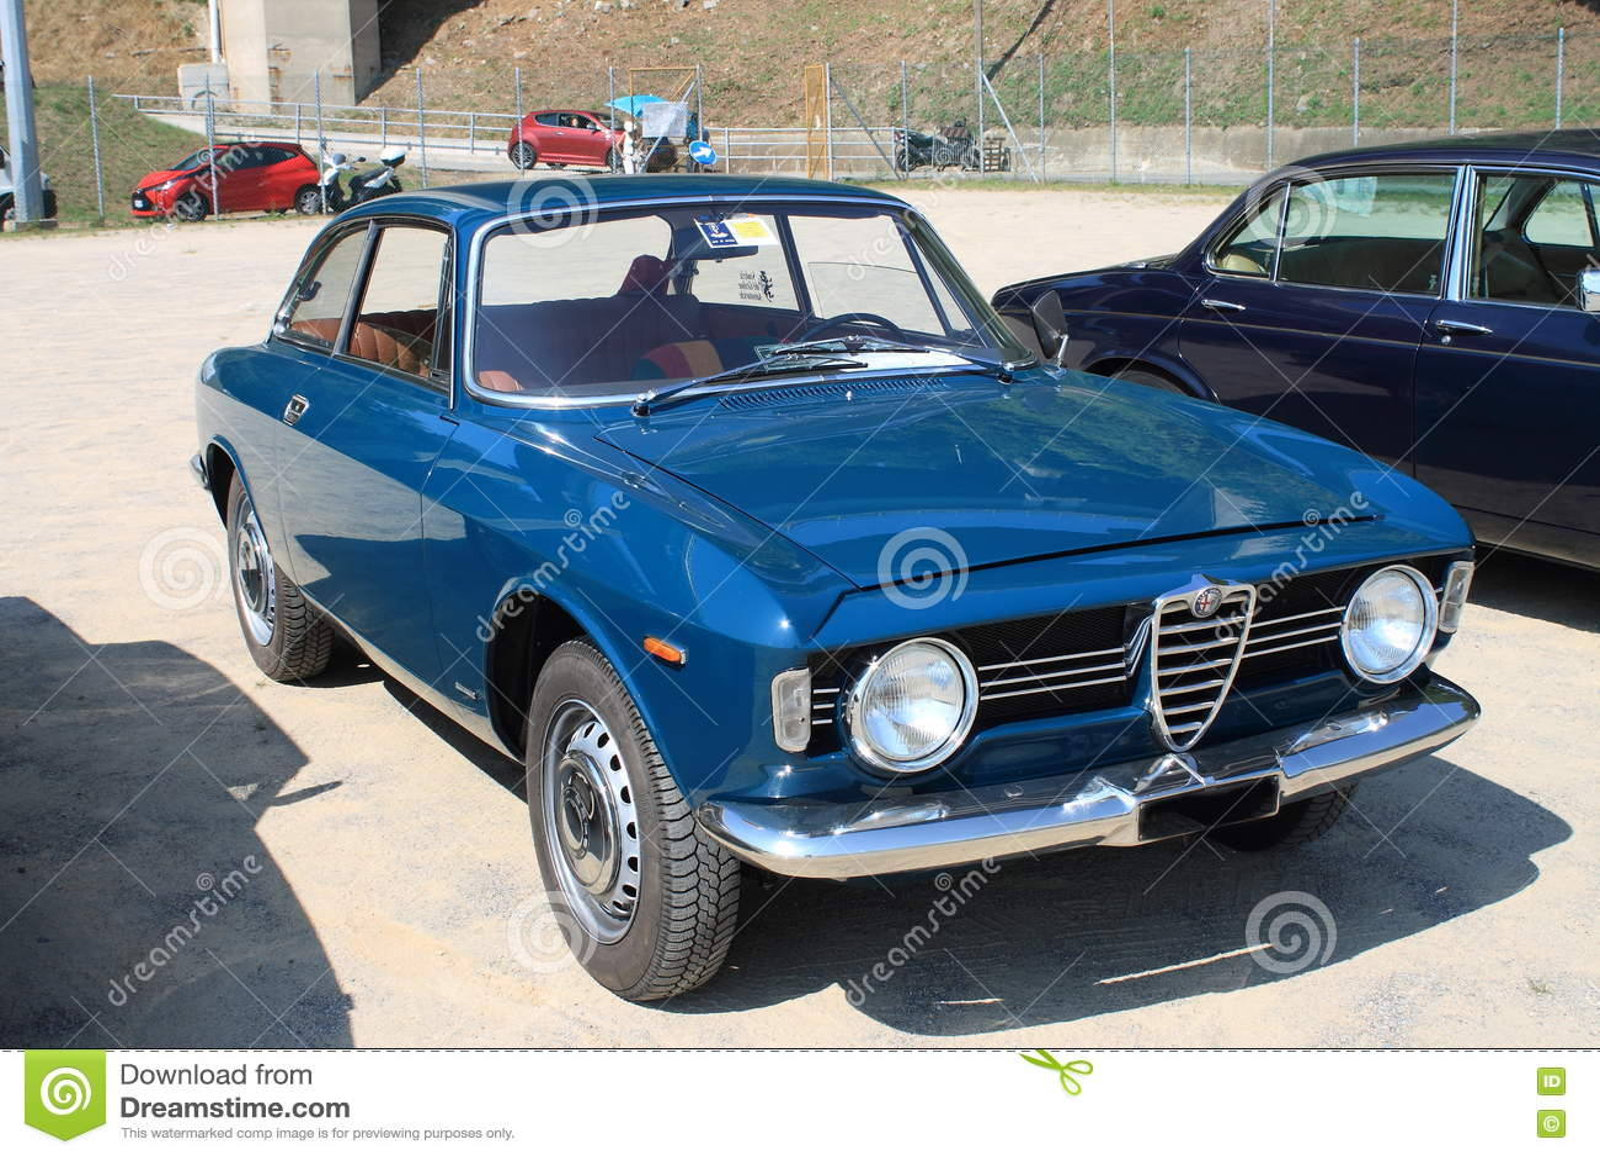 Cars Alfa Romeo Gta 1300 Editorial Photo Image Of Nhistoric 72748981